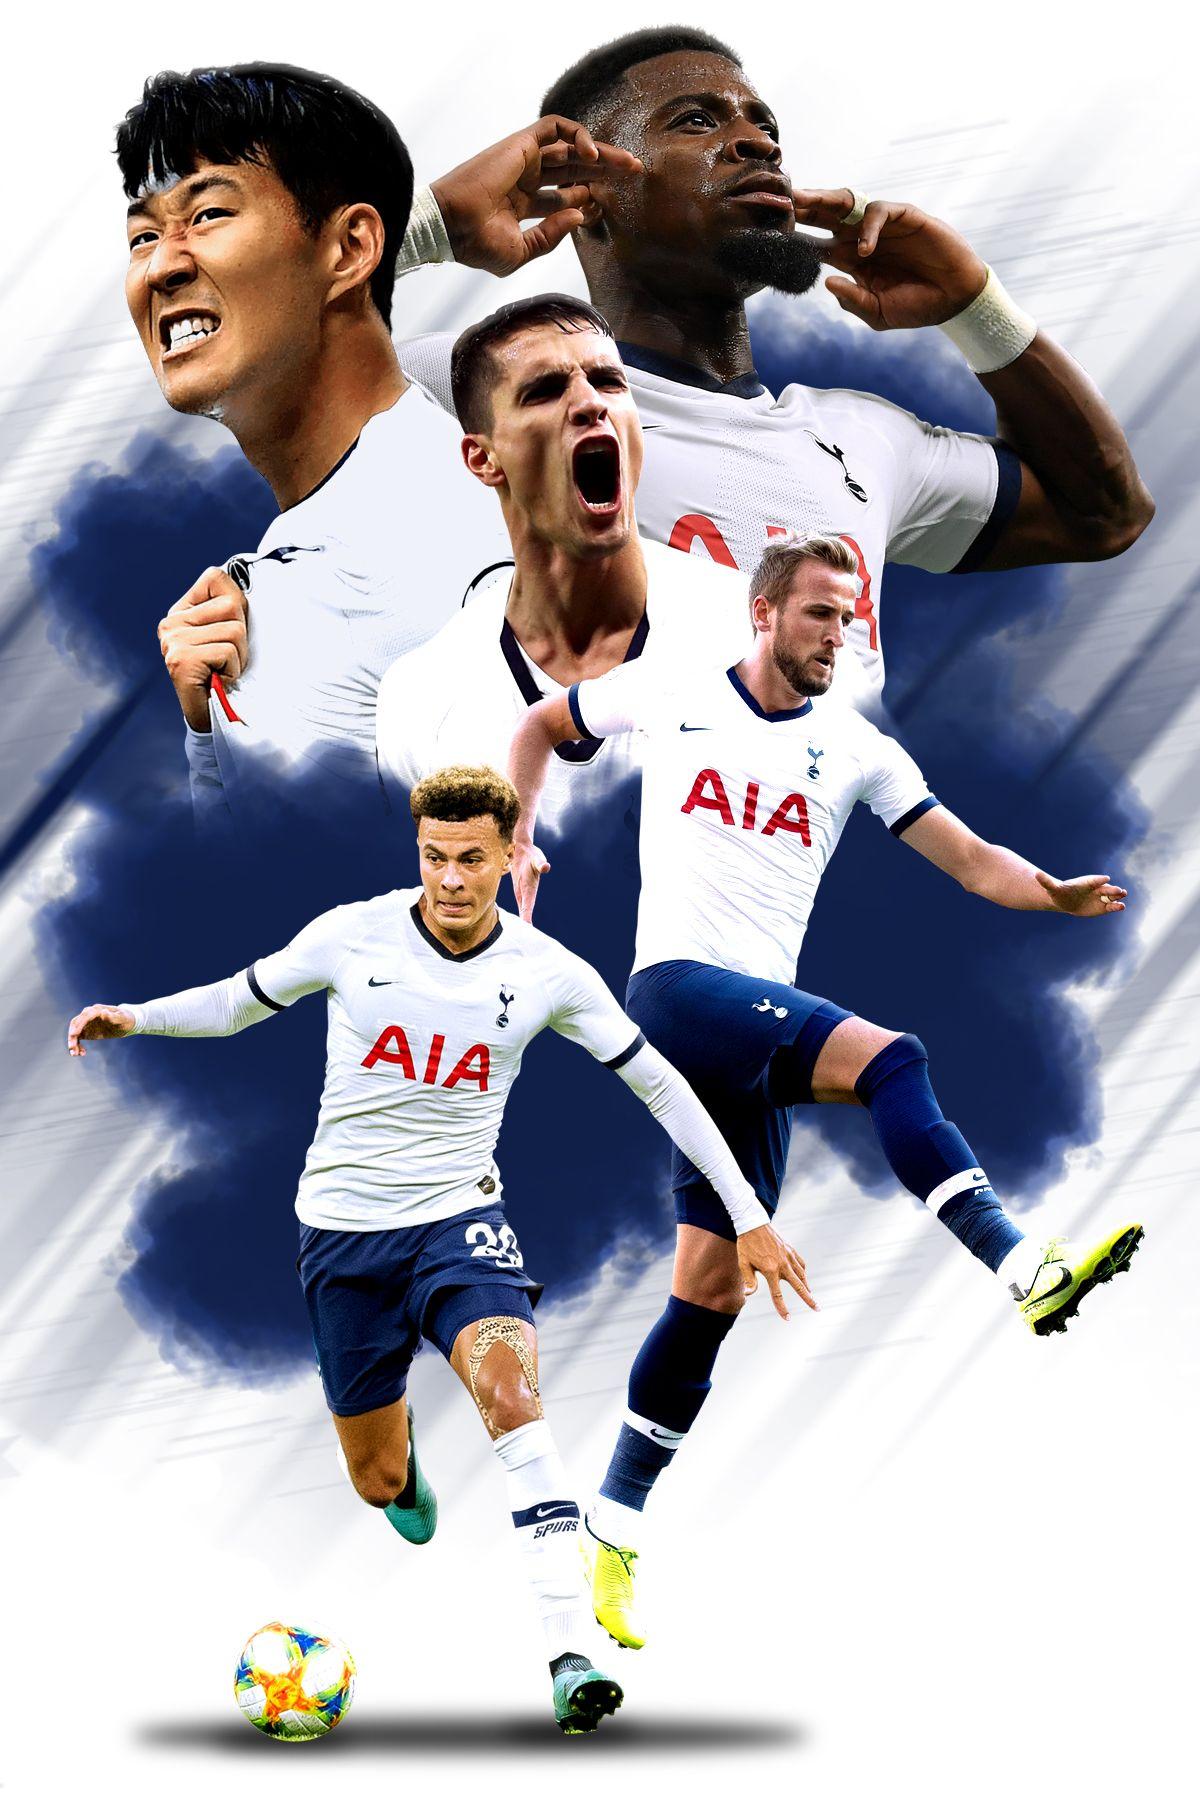 Tottenham Hotspur Poster In 2020 Tottenham Hotspur Tottenham Hotspur Wallpaper Tottenham Hotspur Players